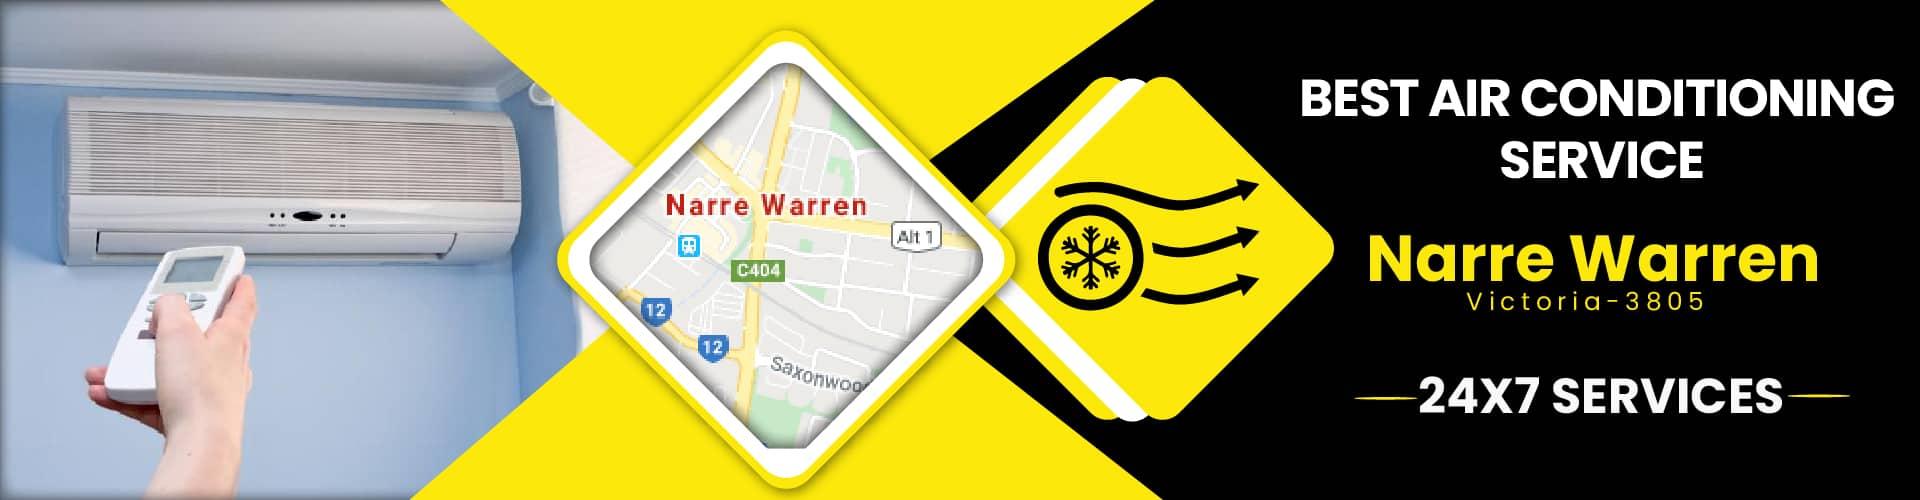 Air Conditioning Narre Warren